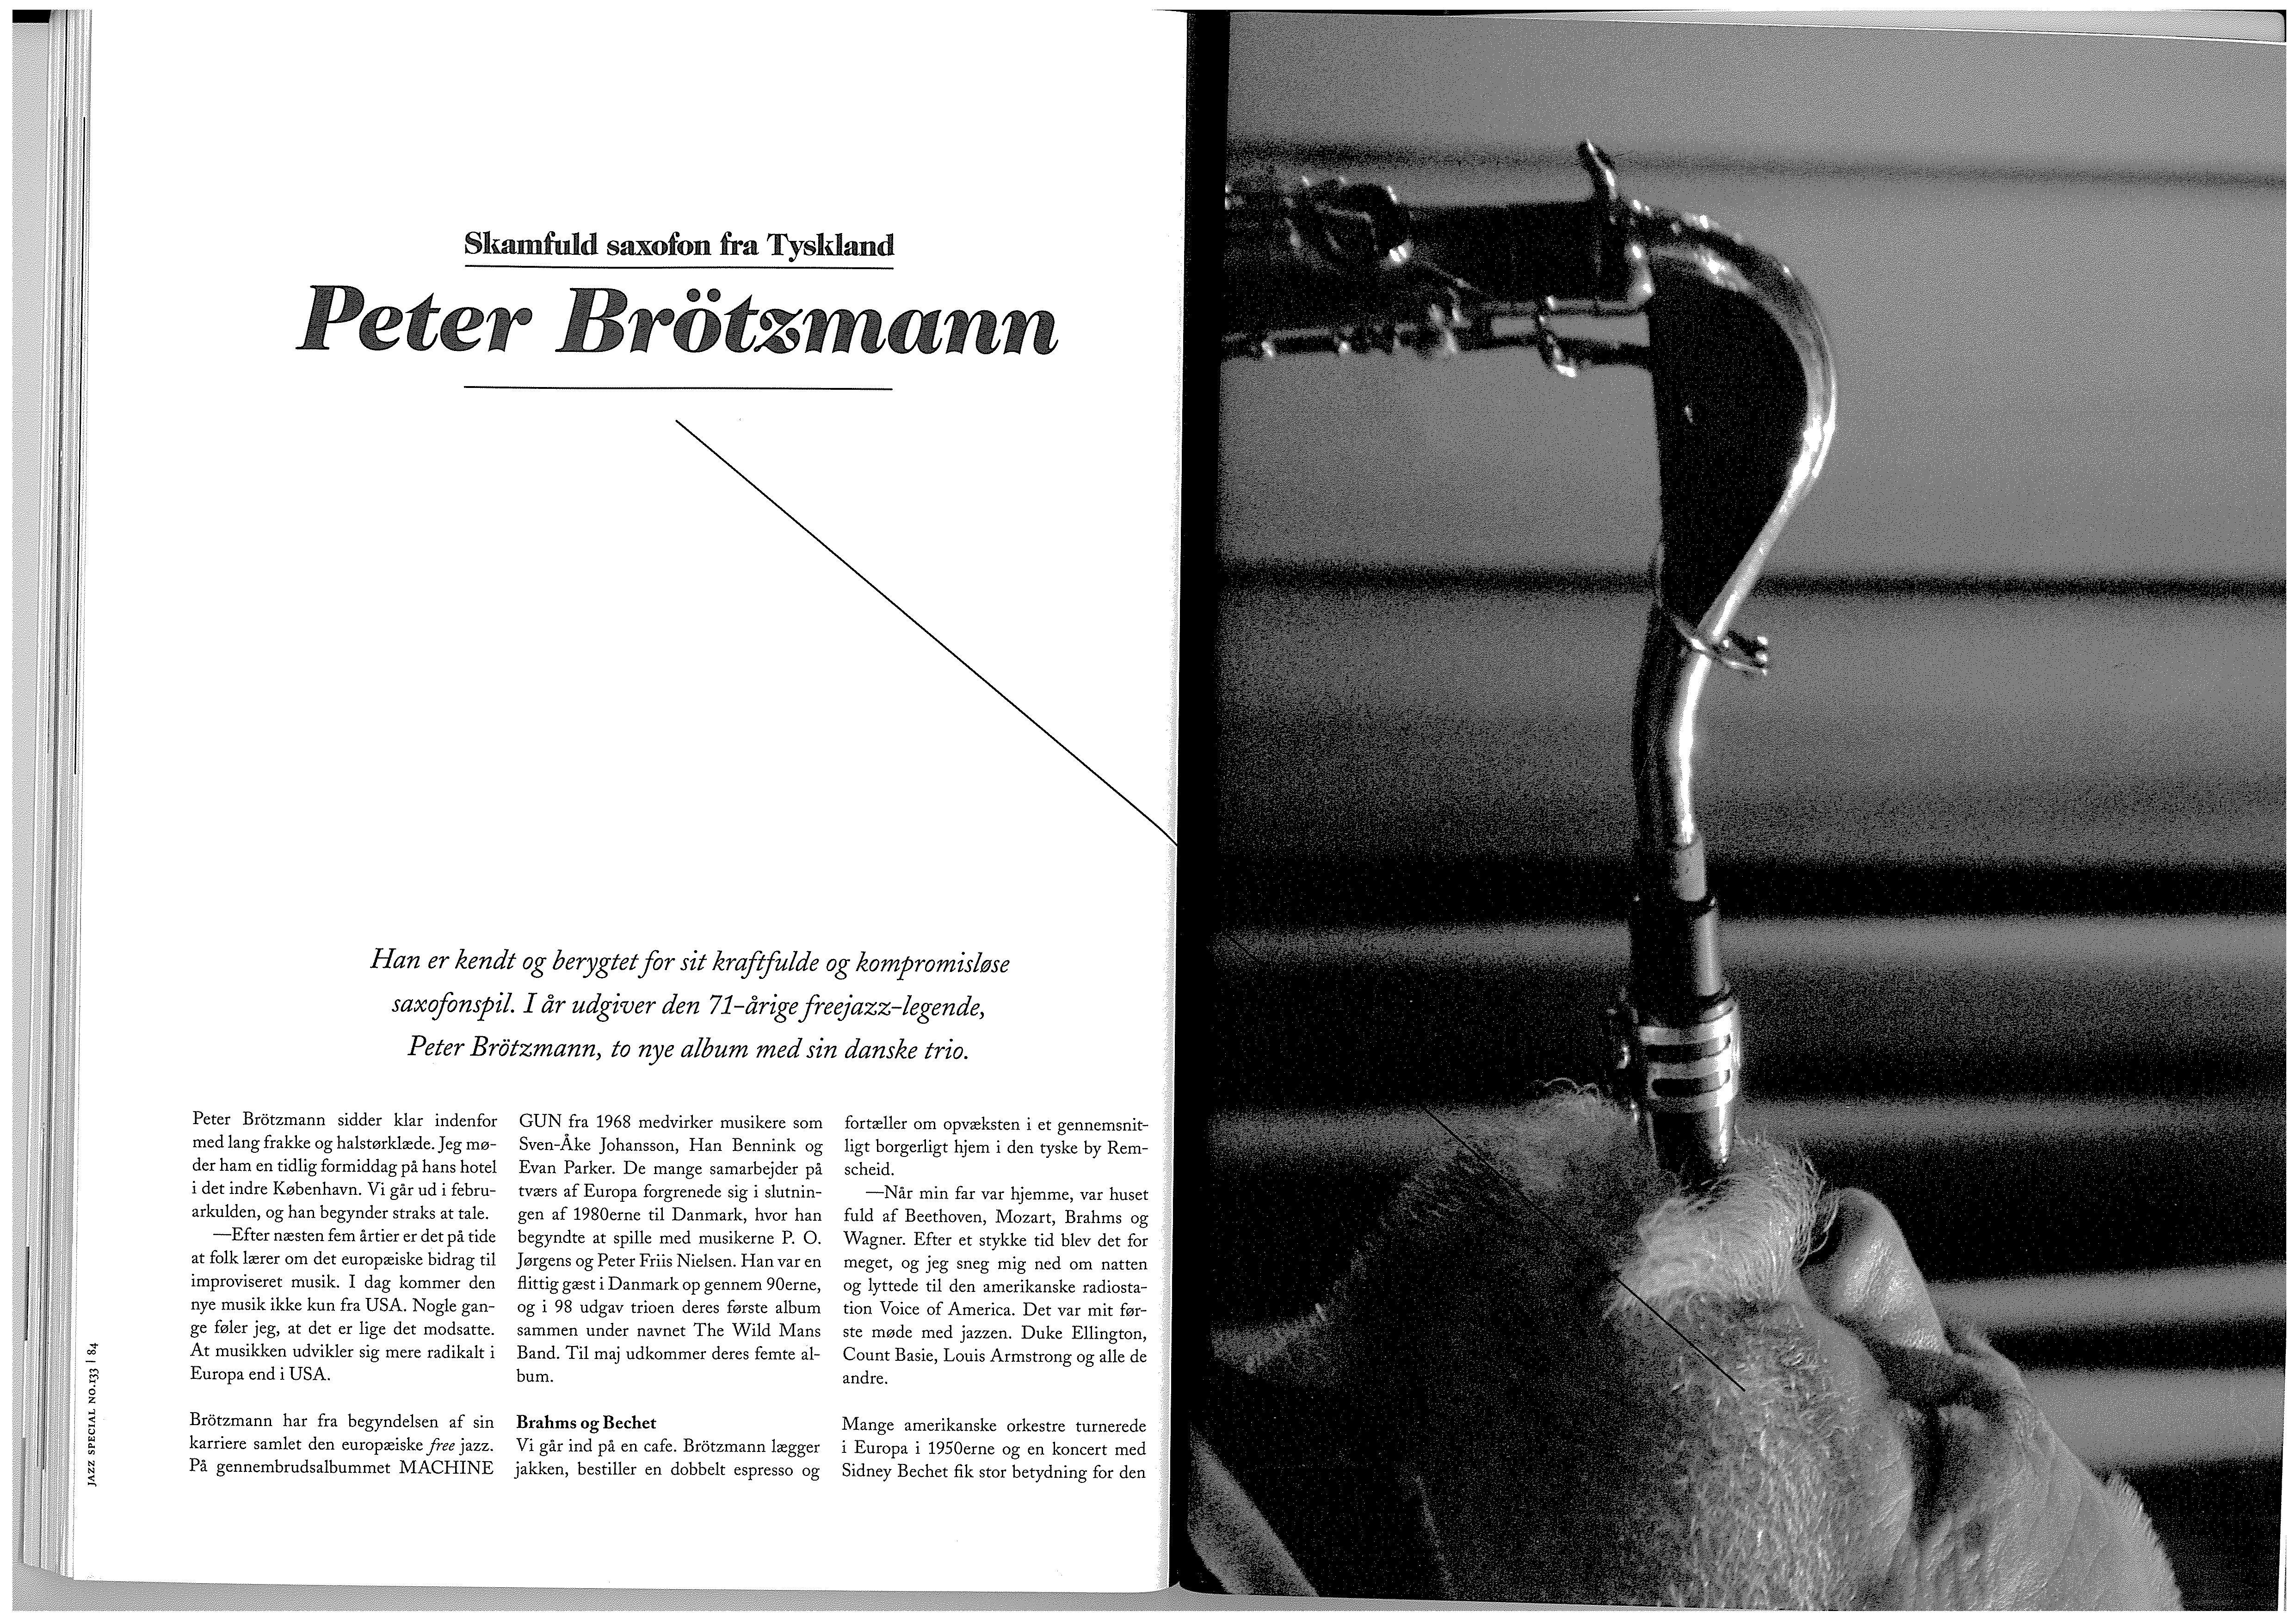 Peter-Brötzmann-page-001